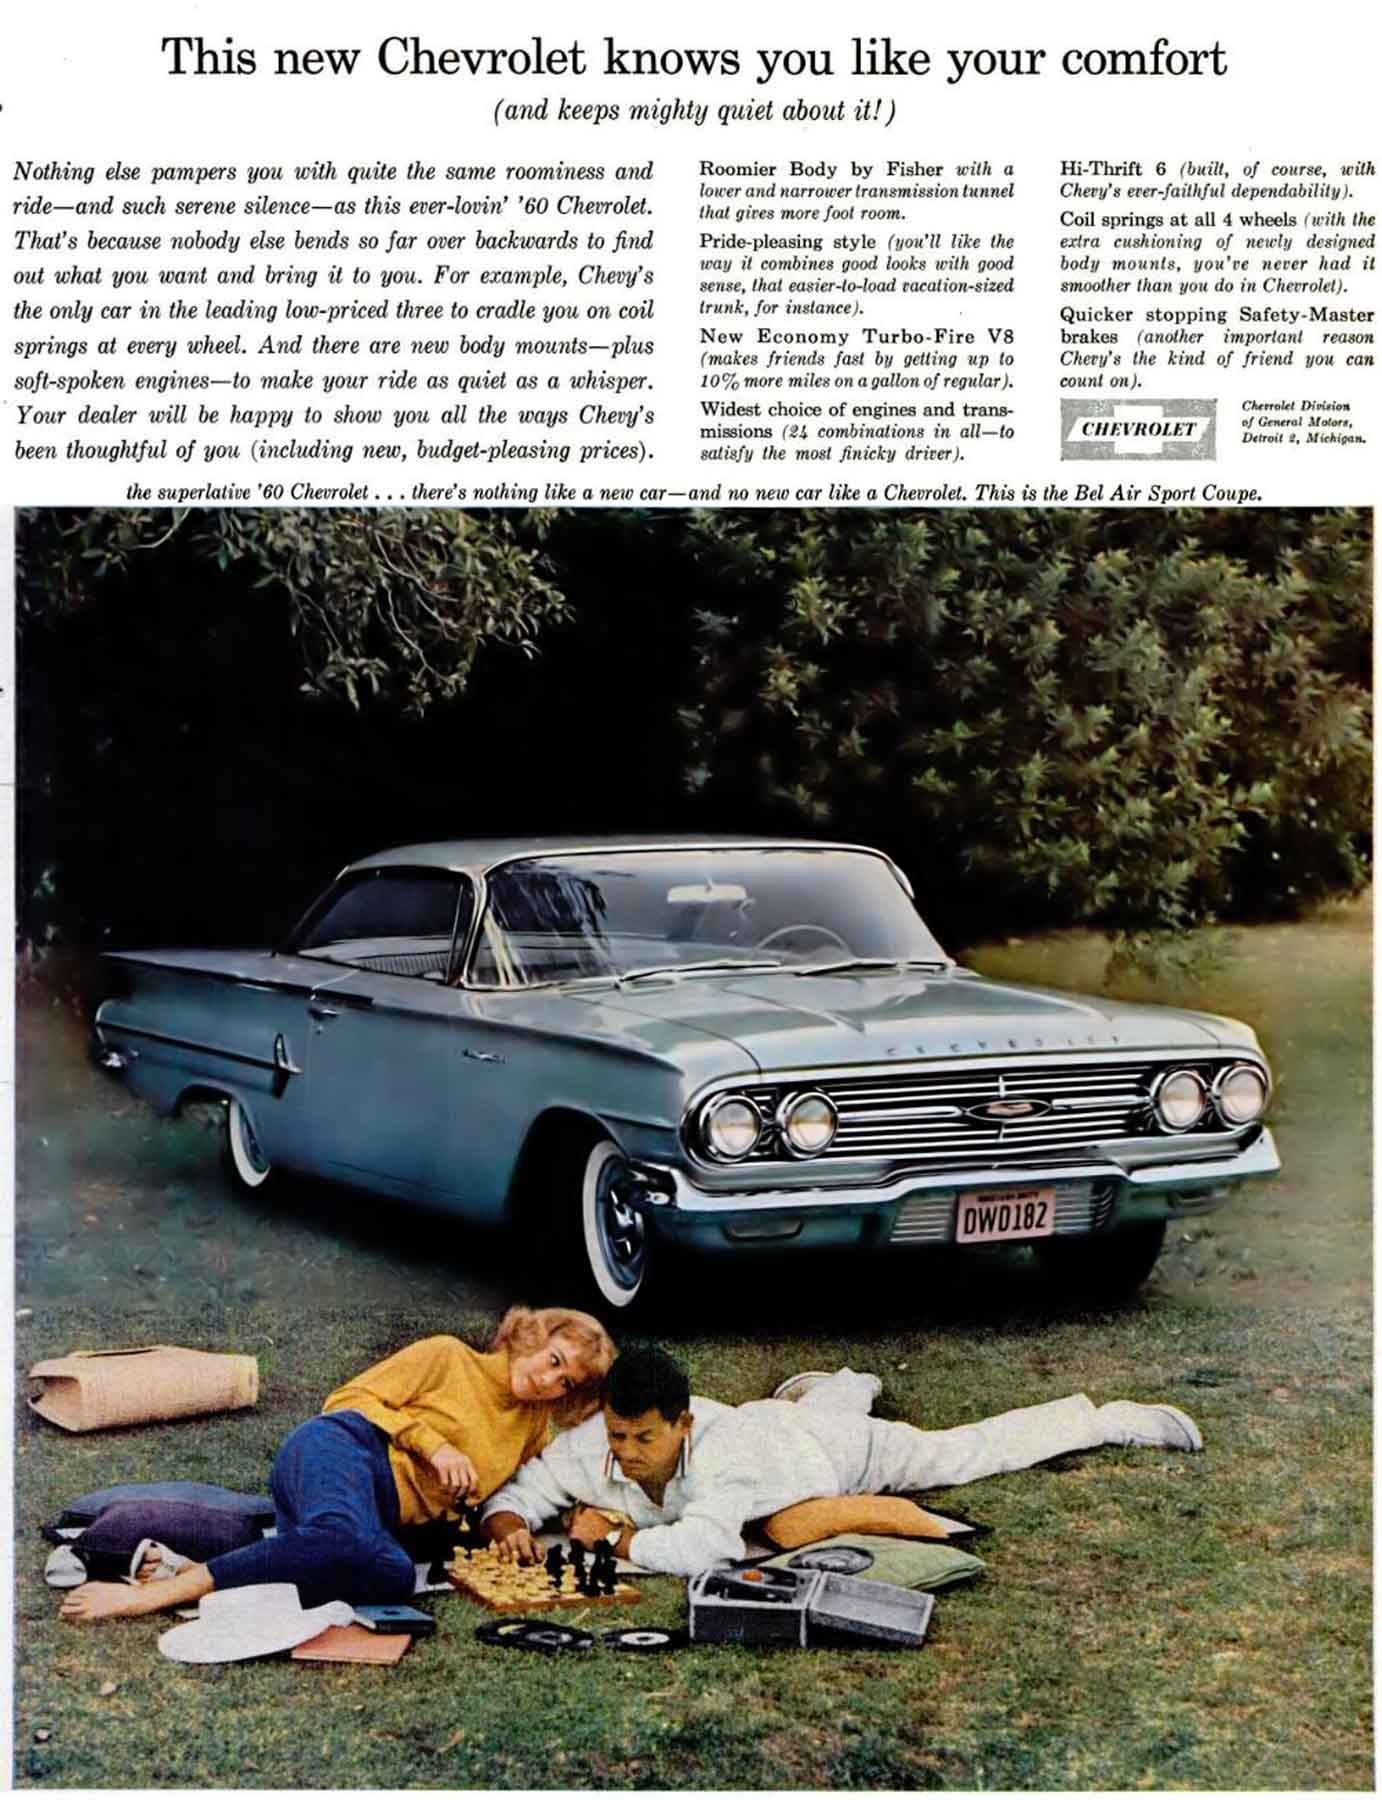 Kelebihan Chevrolet 1960 Top Model Tahun Ini